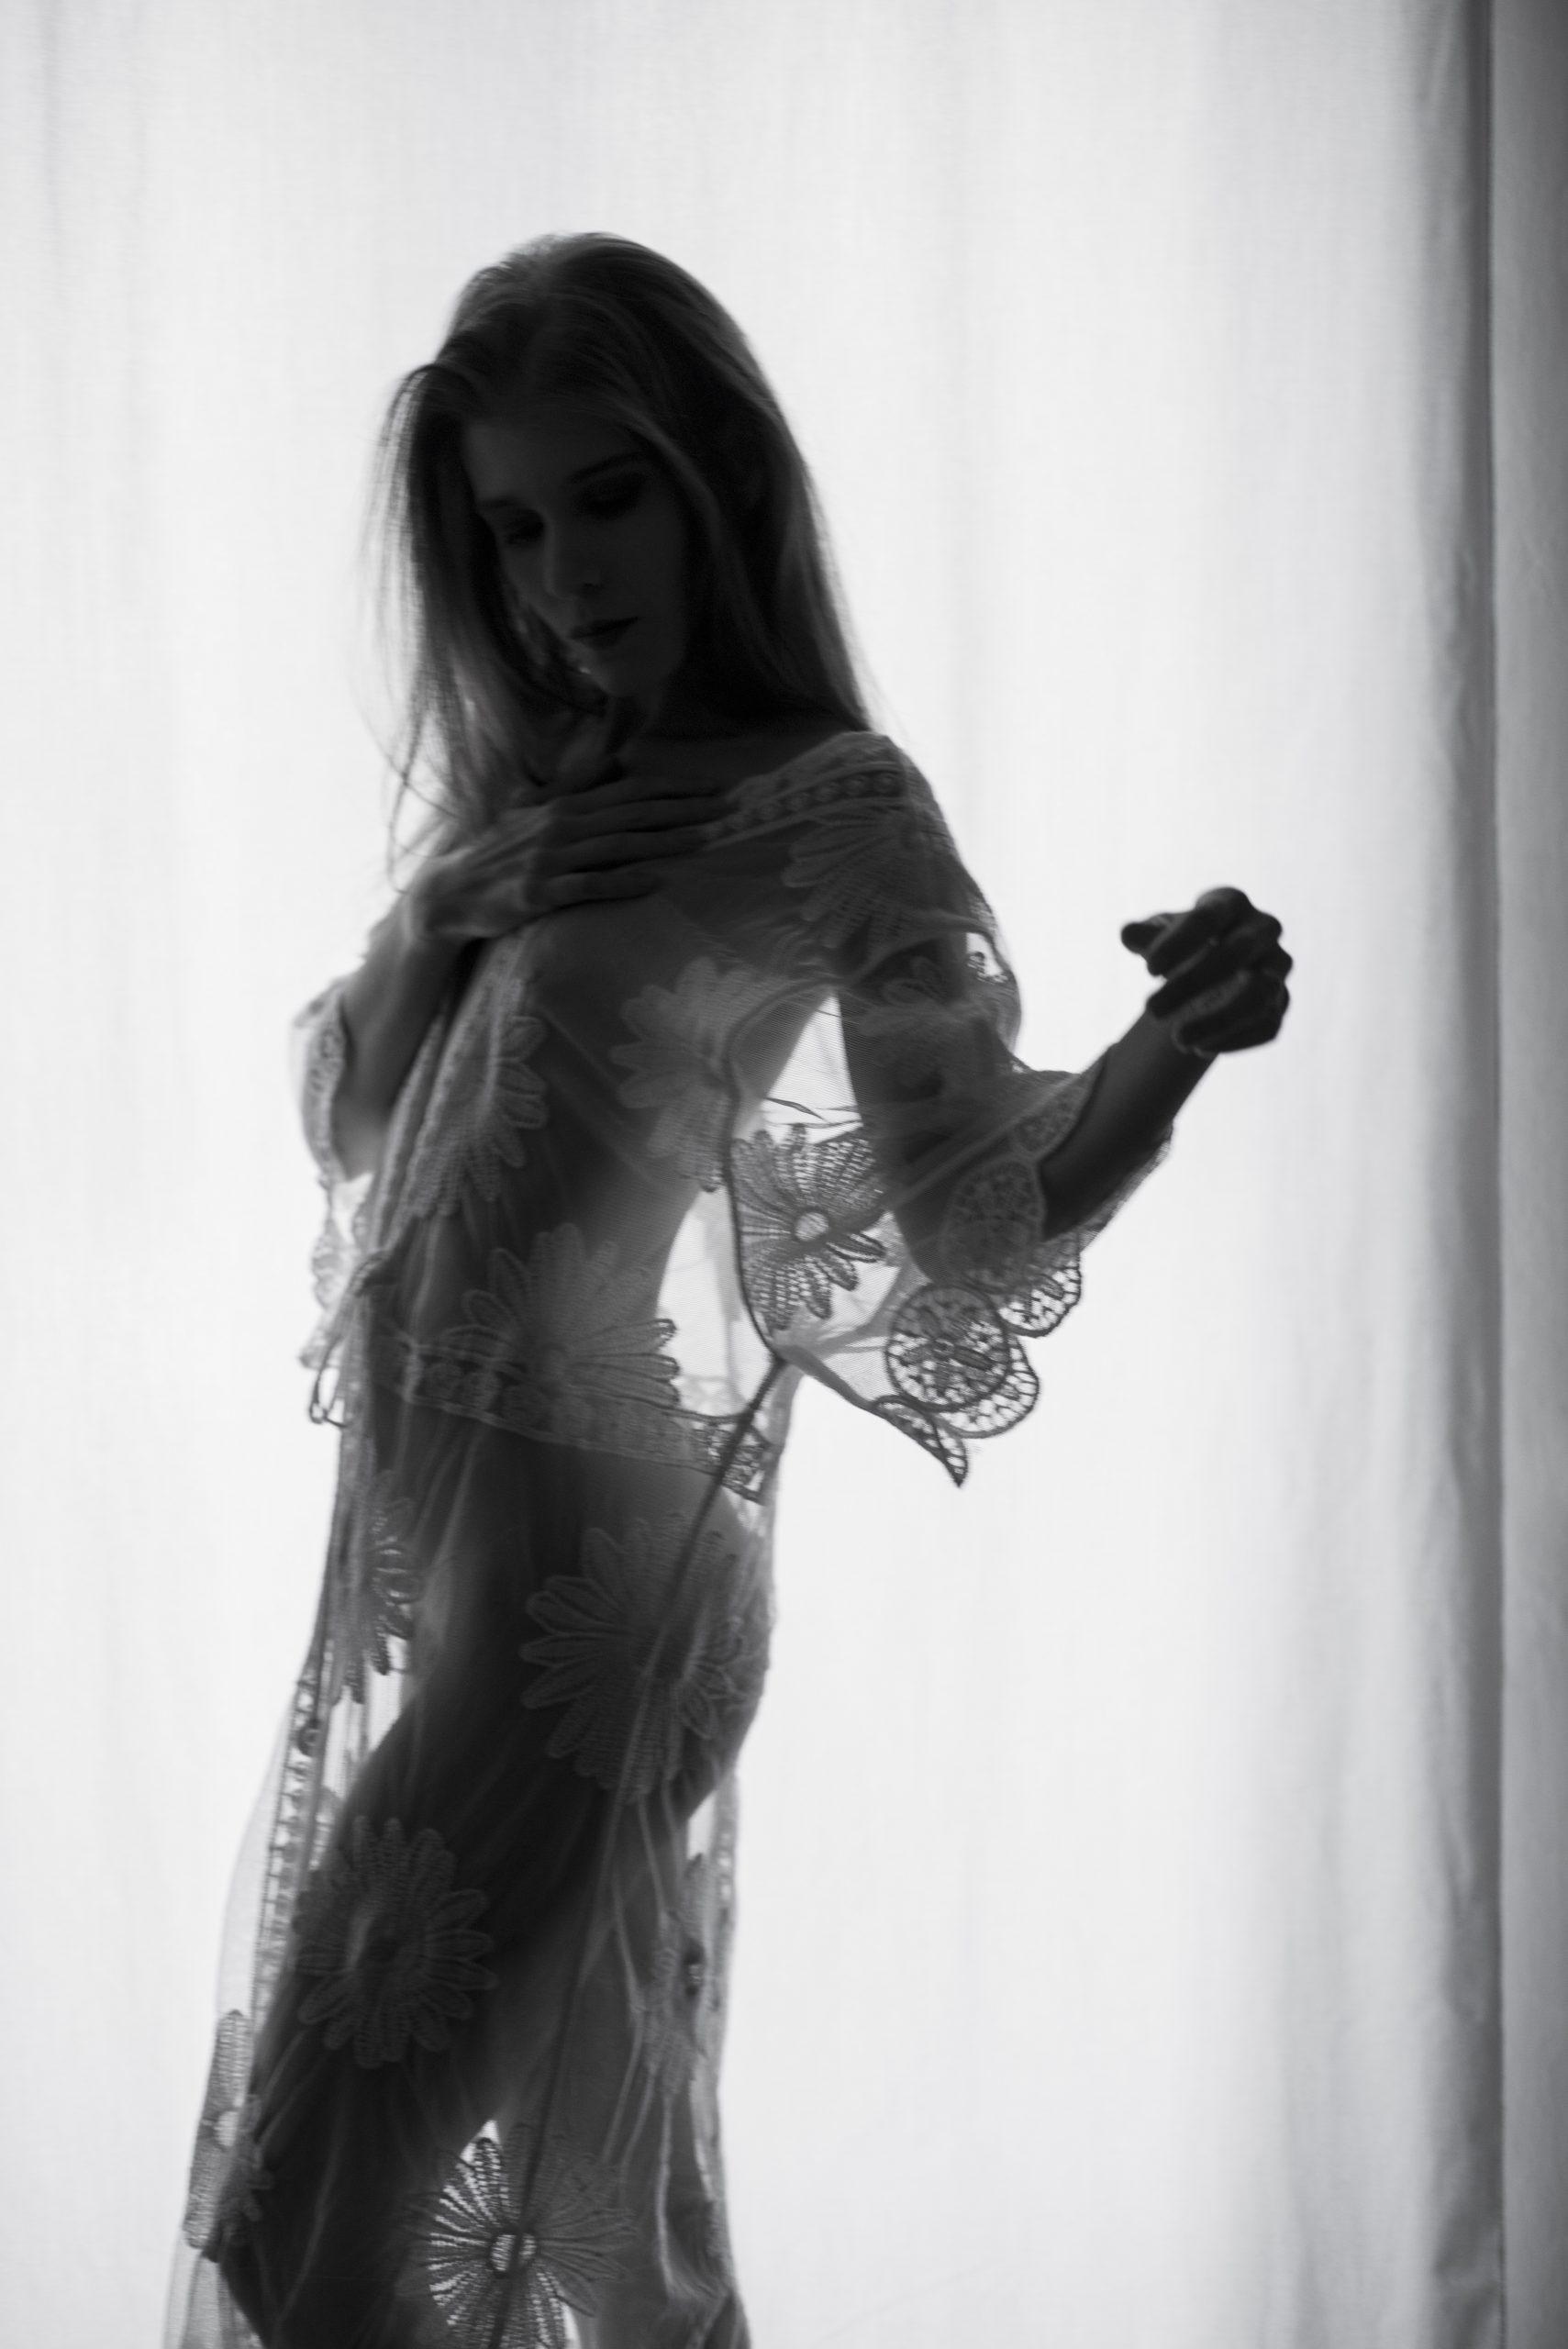 Categorie: Boudoir & Nude, Glamour, Portrait; Photographer: AURORA LIPERINI; Model: ELISA PAGANO; Location: Livorno, LI, Italia